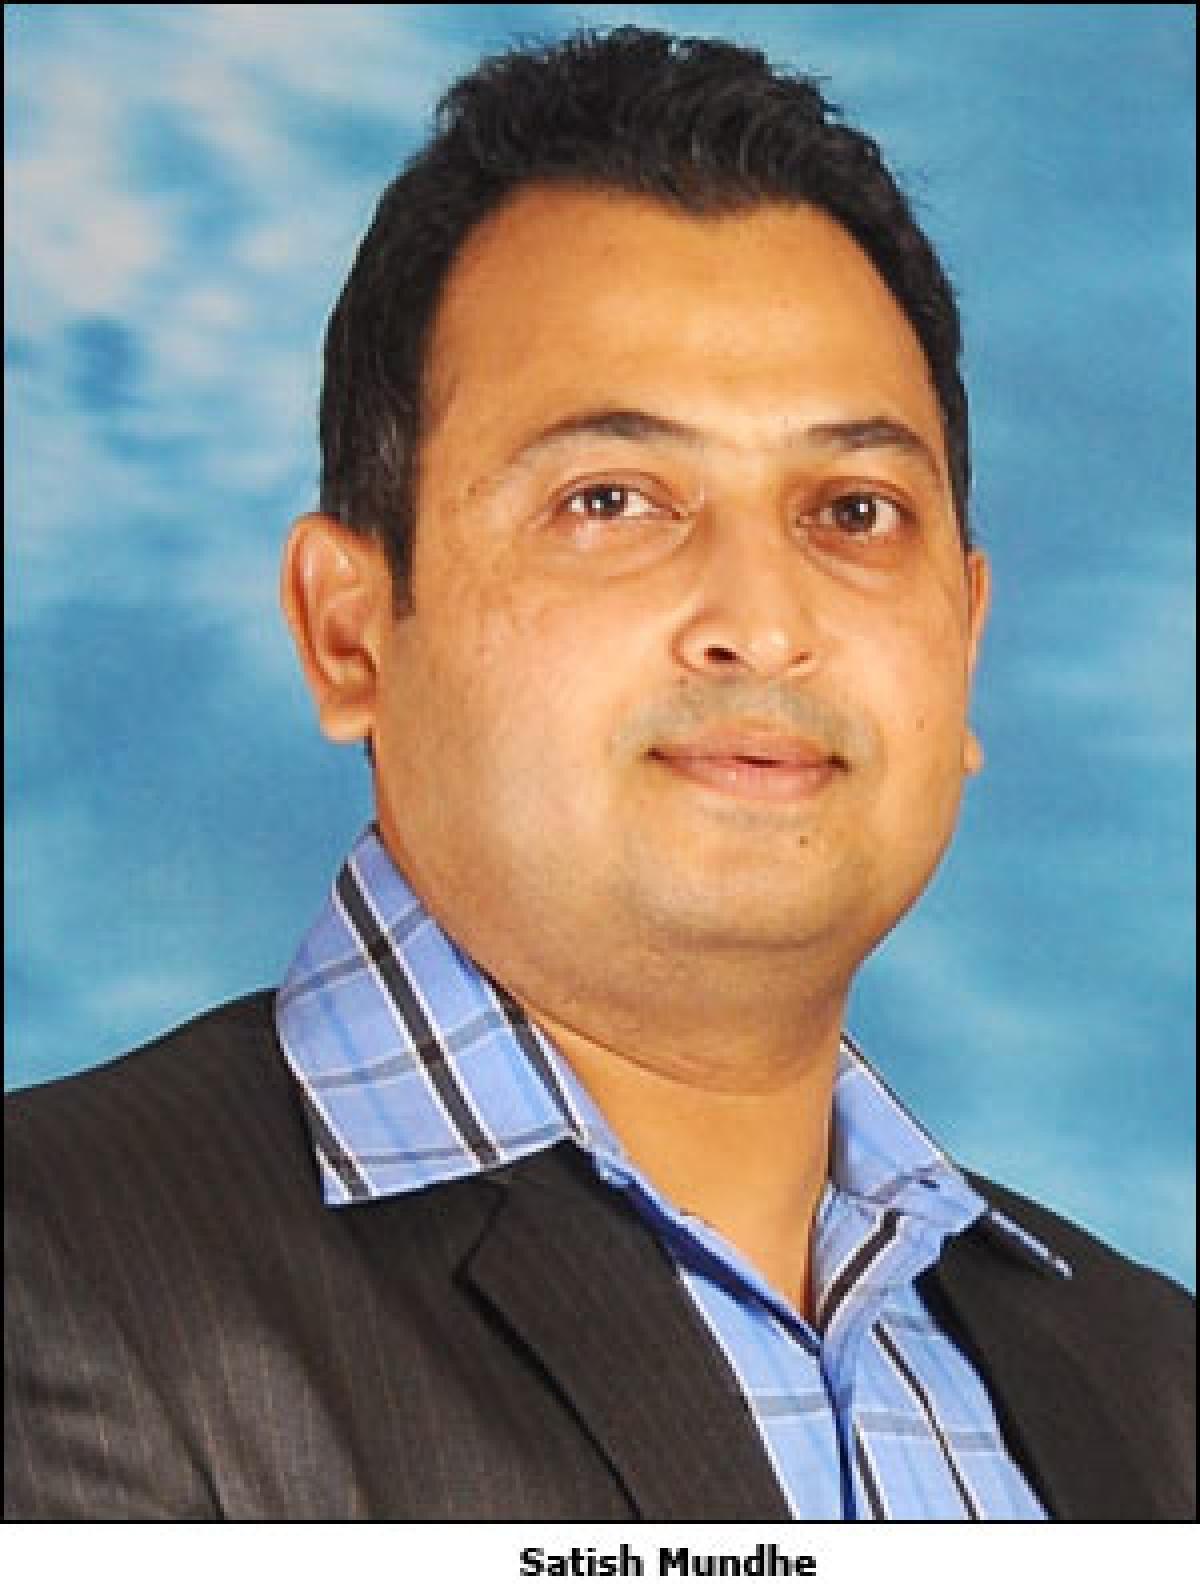 United Mediaworks appoints Satish Mundhe as VP - media sales